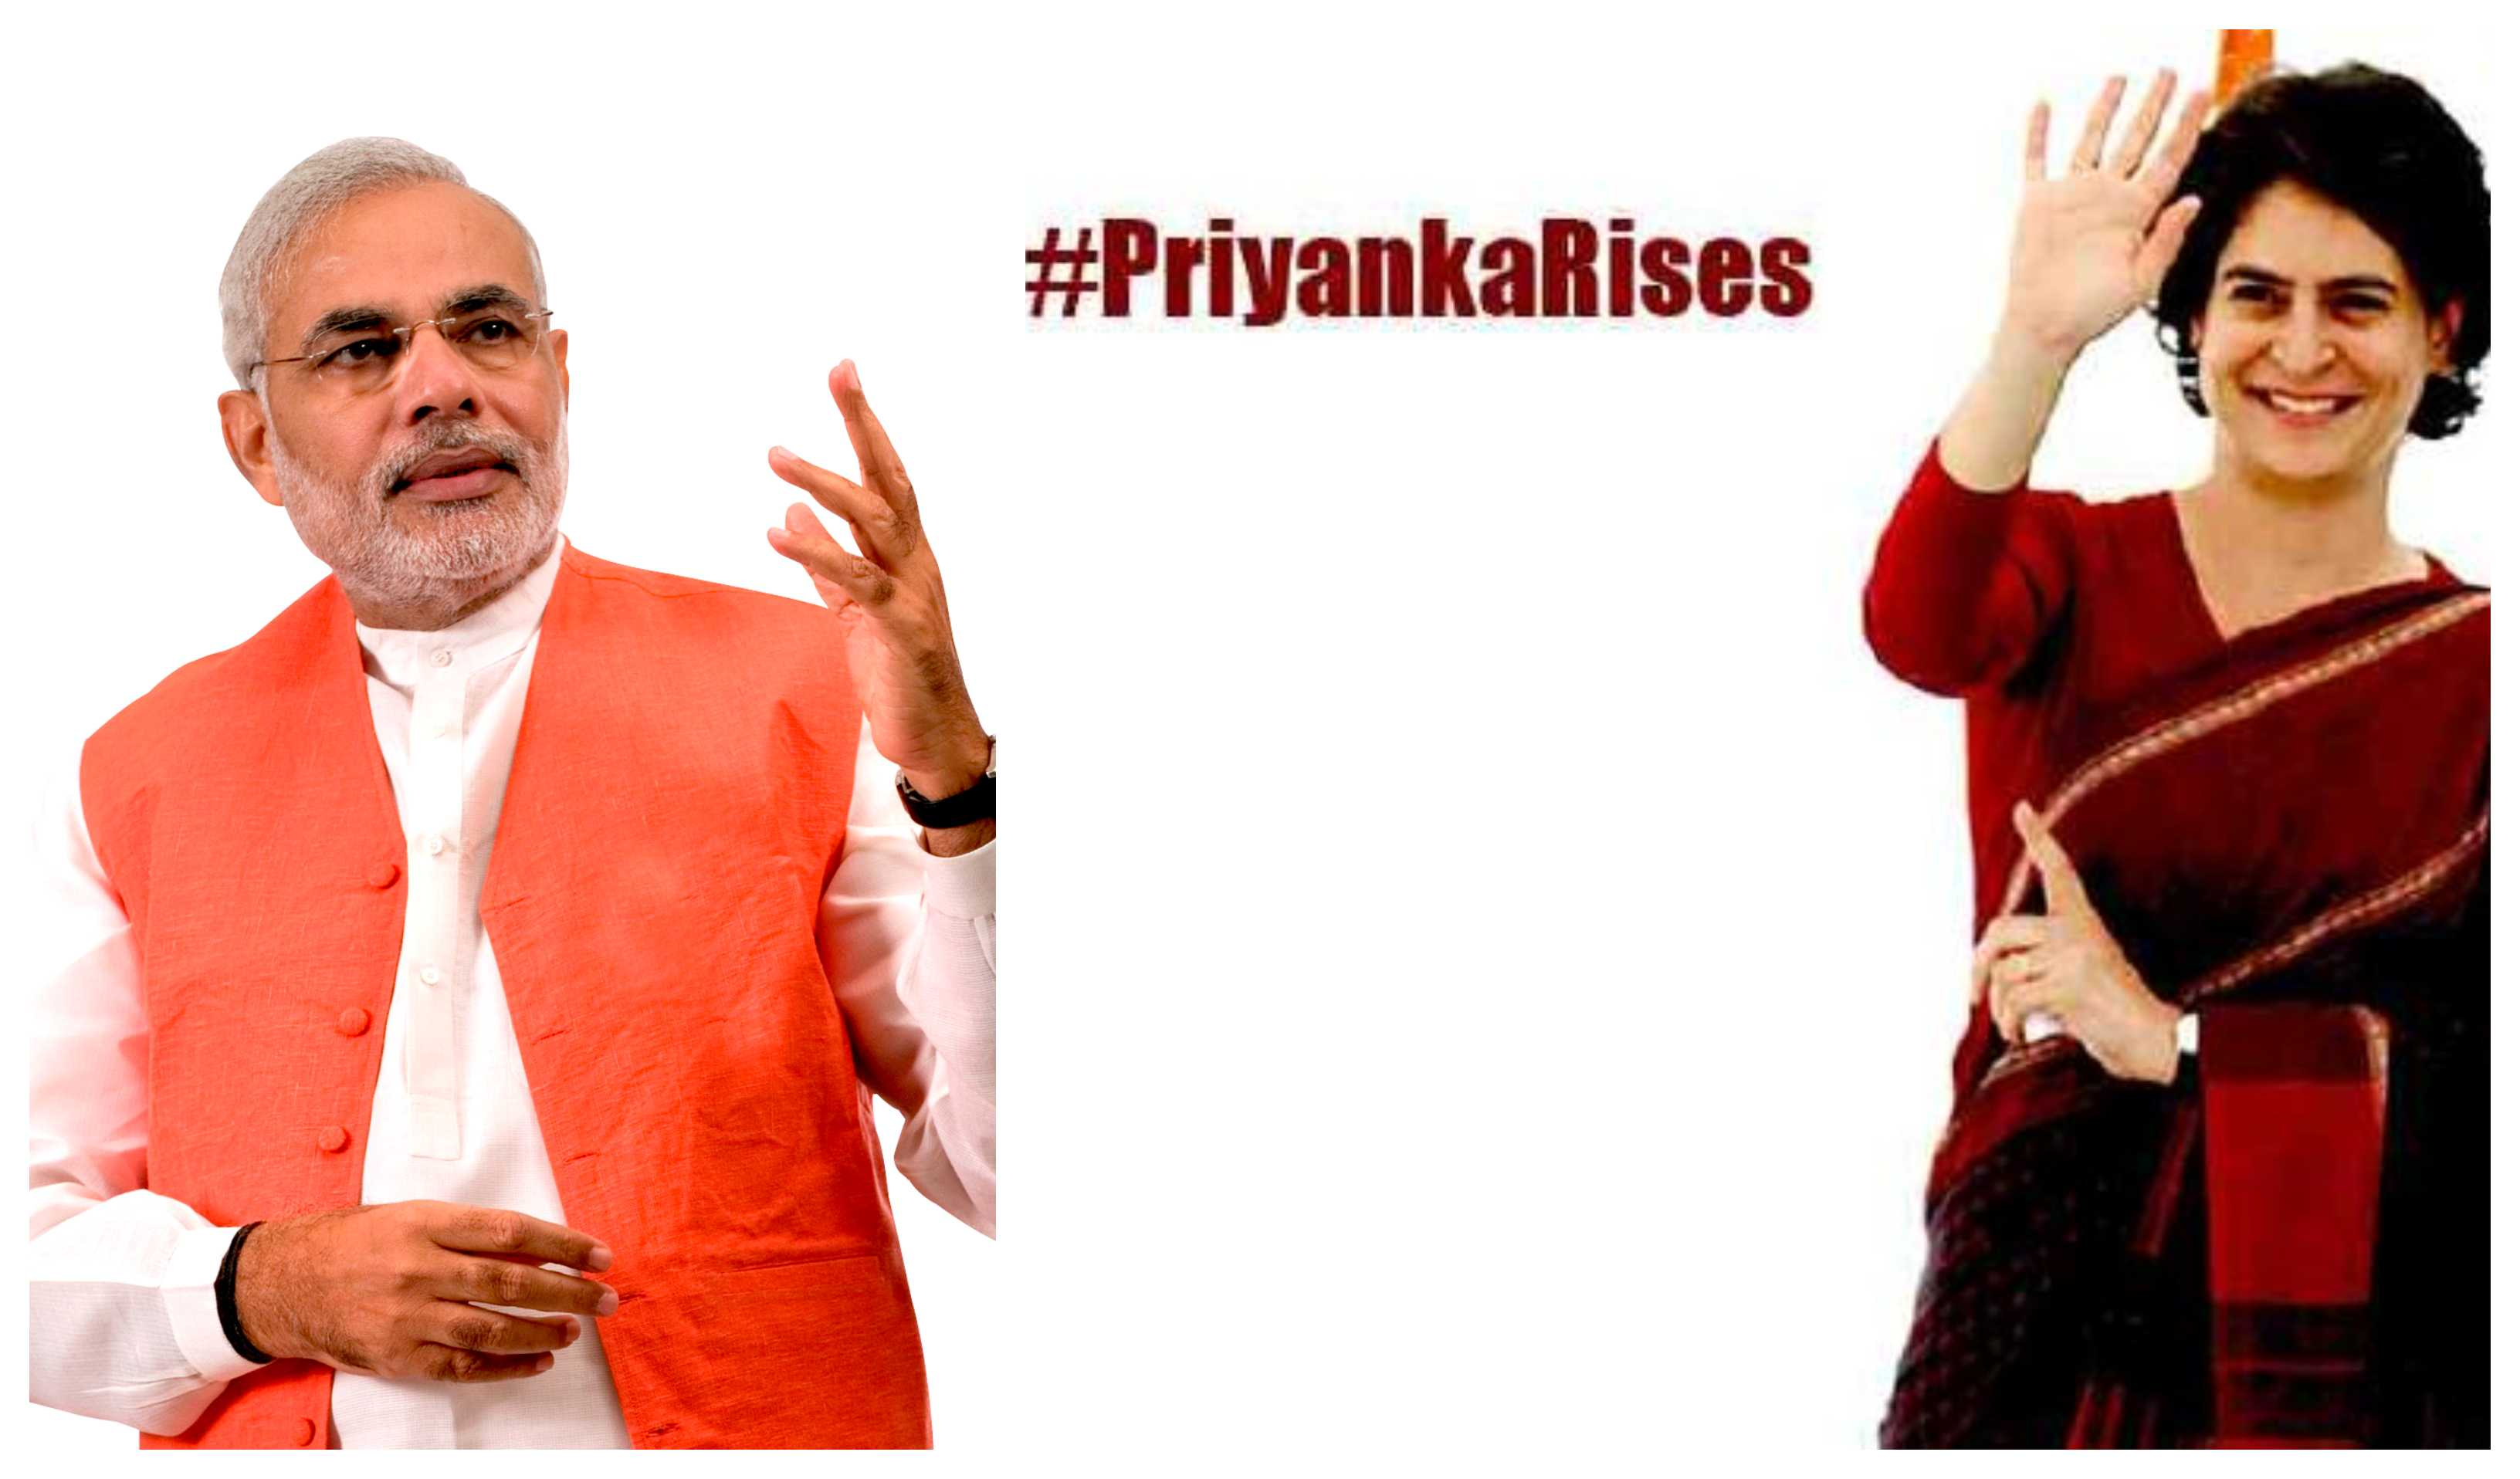 Priyanka Gandhi retaliated on Modi blog